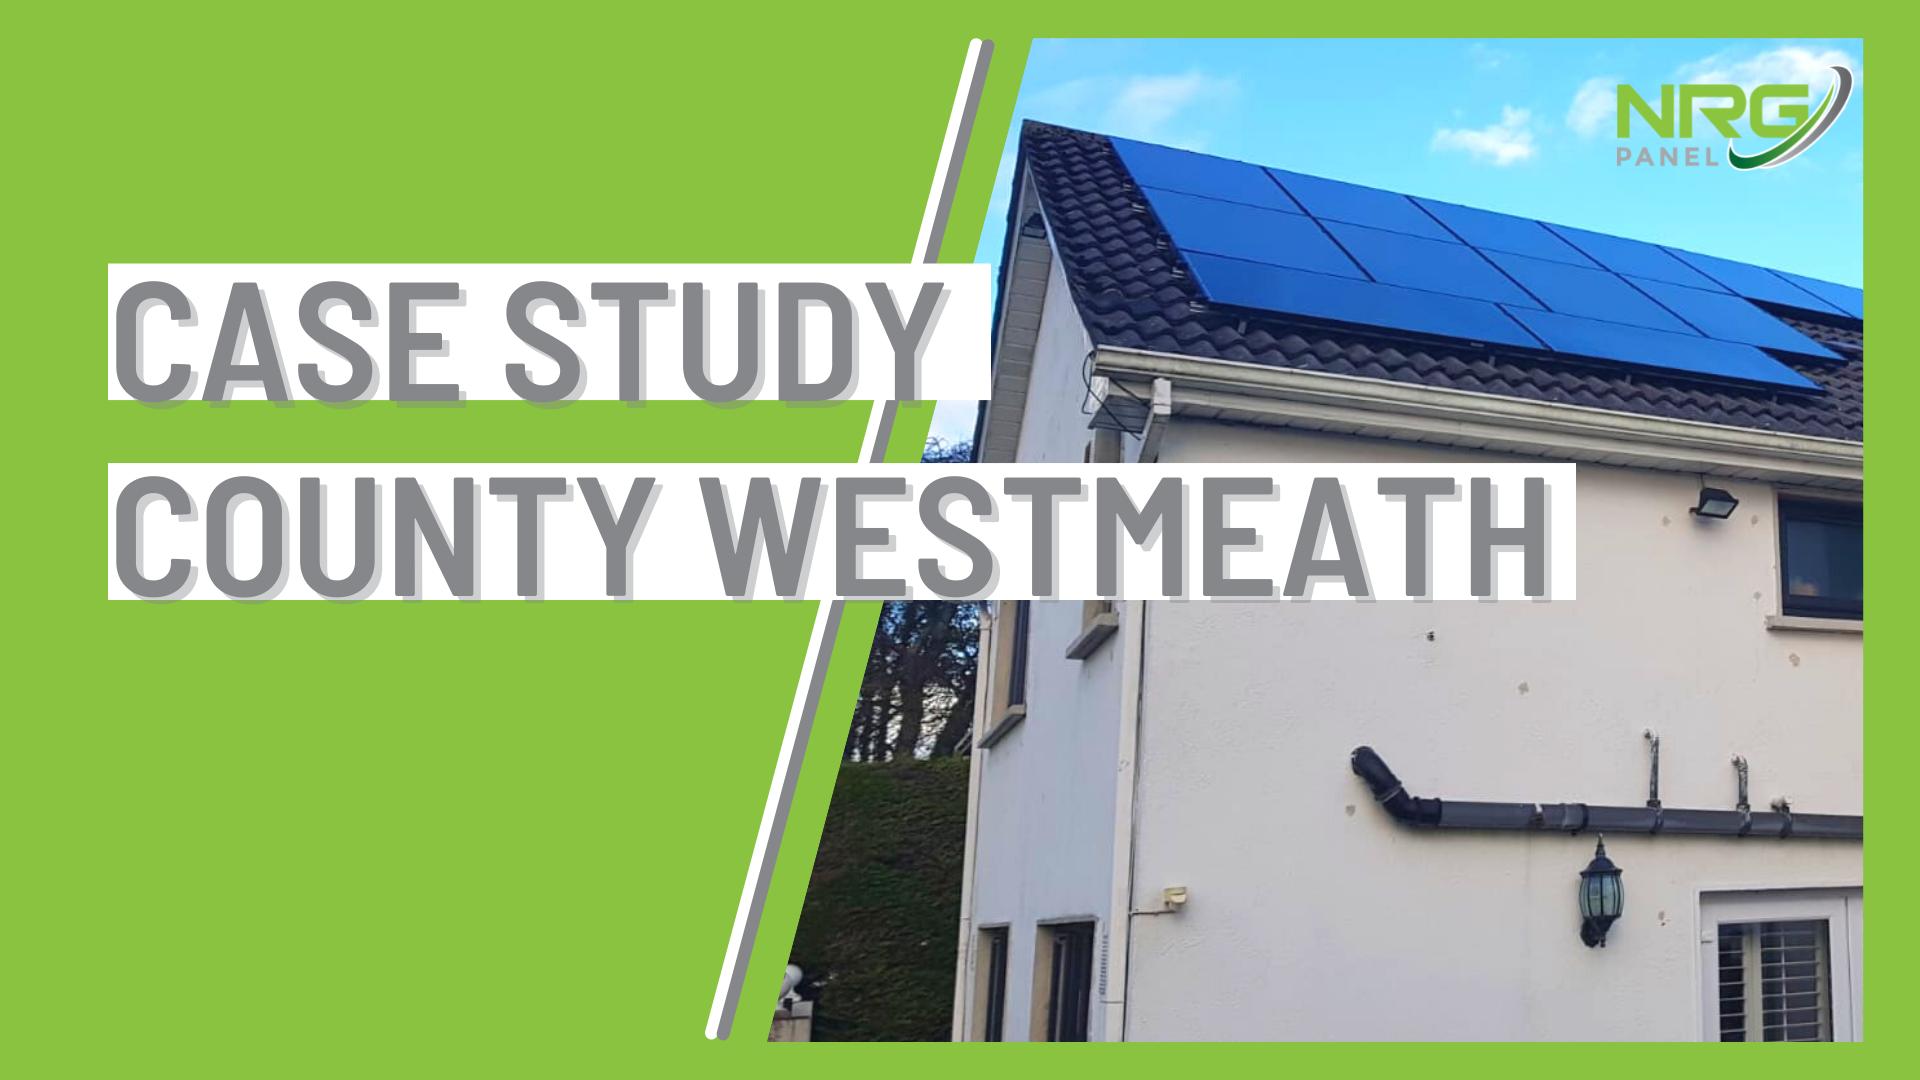 Case Study - Solar Panel Install Co. Westmeath - NRG Panel - #1 (1)